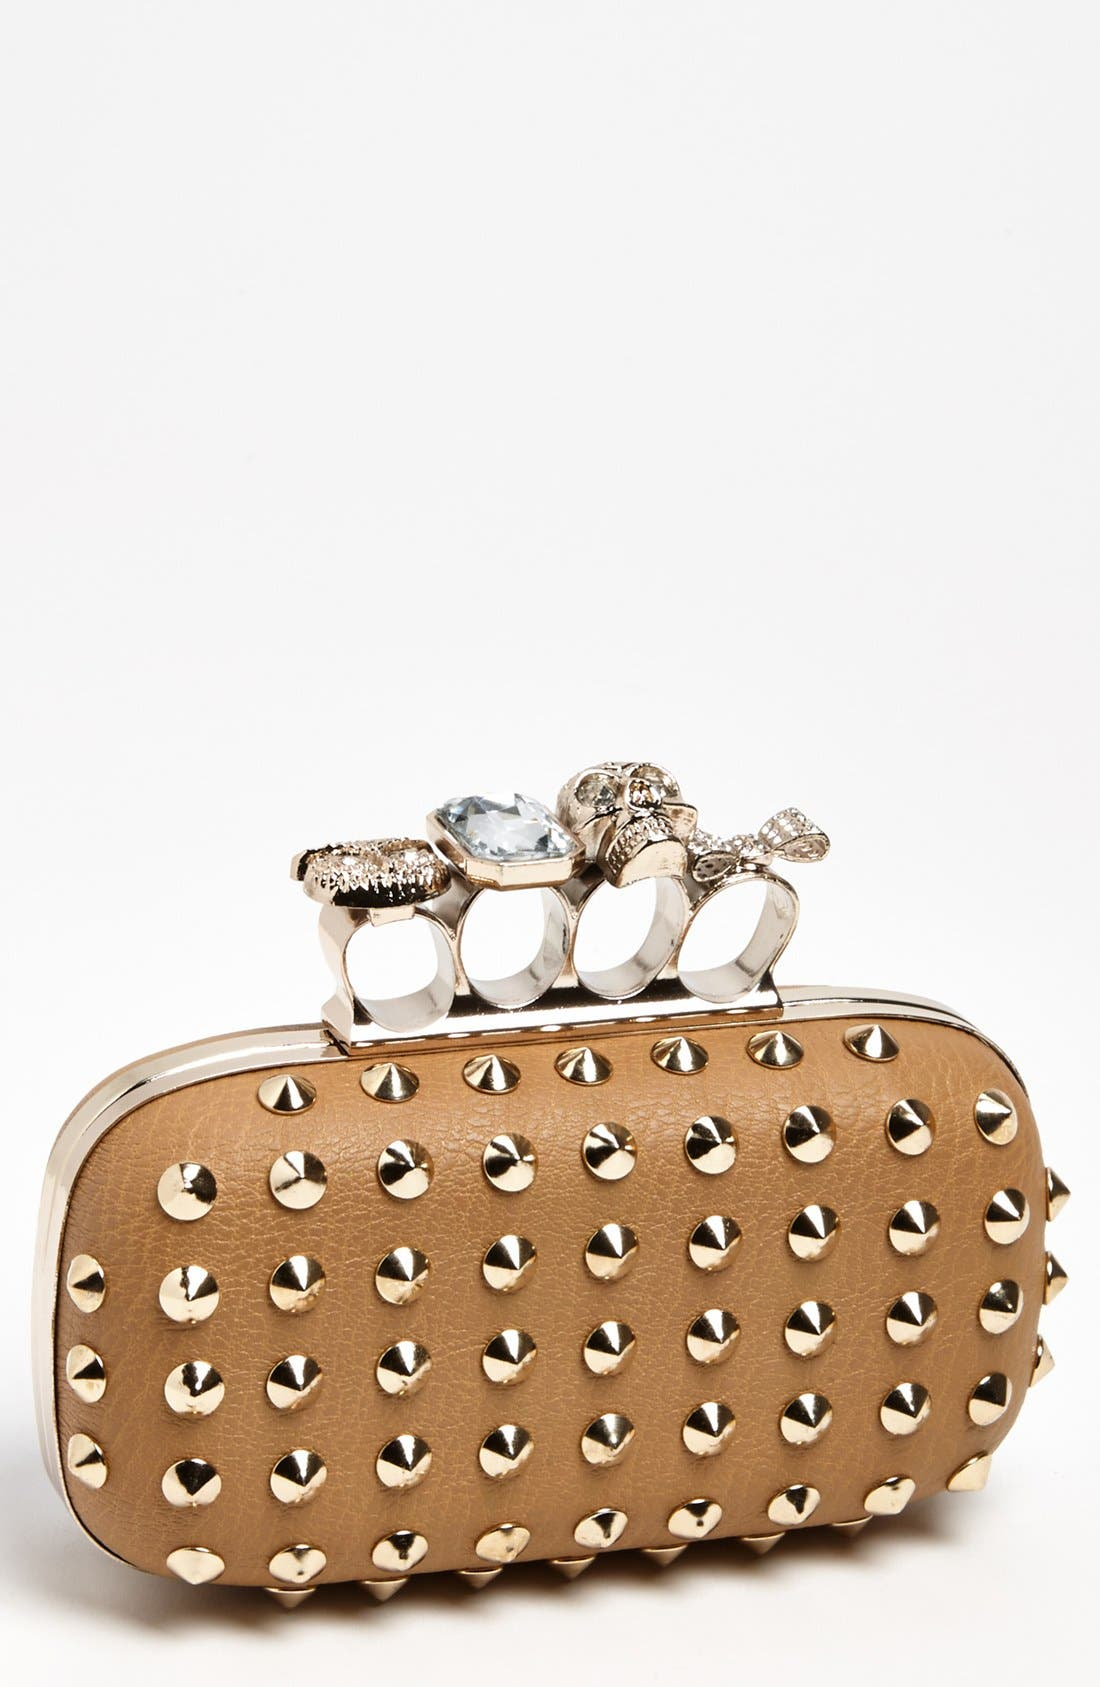 Alternate Image 1 Selected - Natasha Couture 'Finger' Studded Clutch